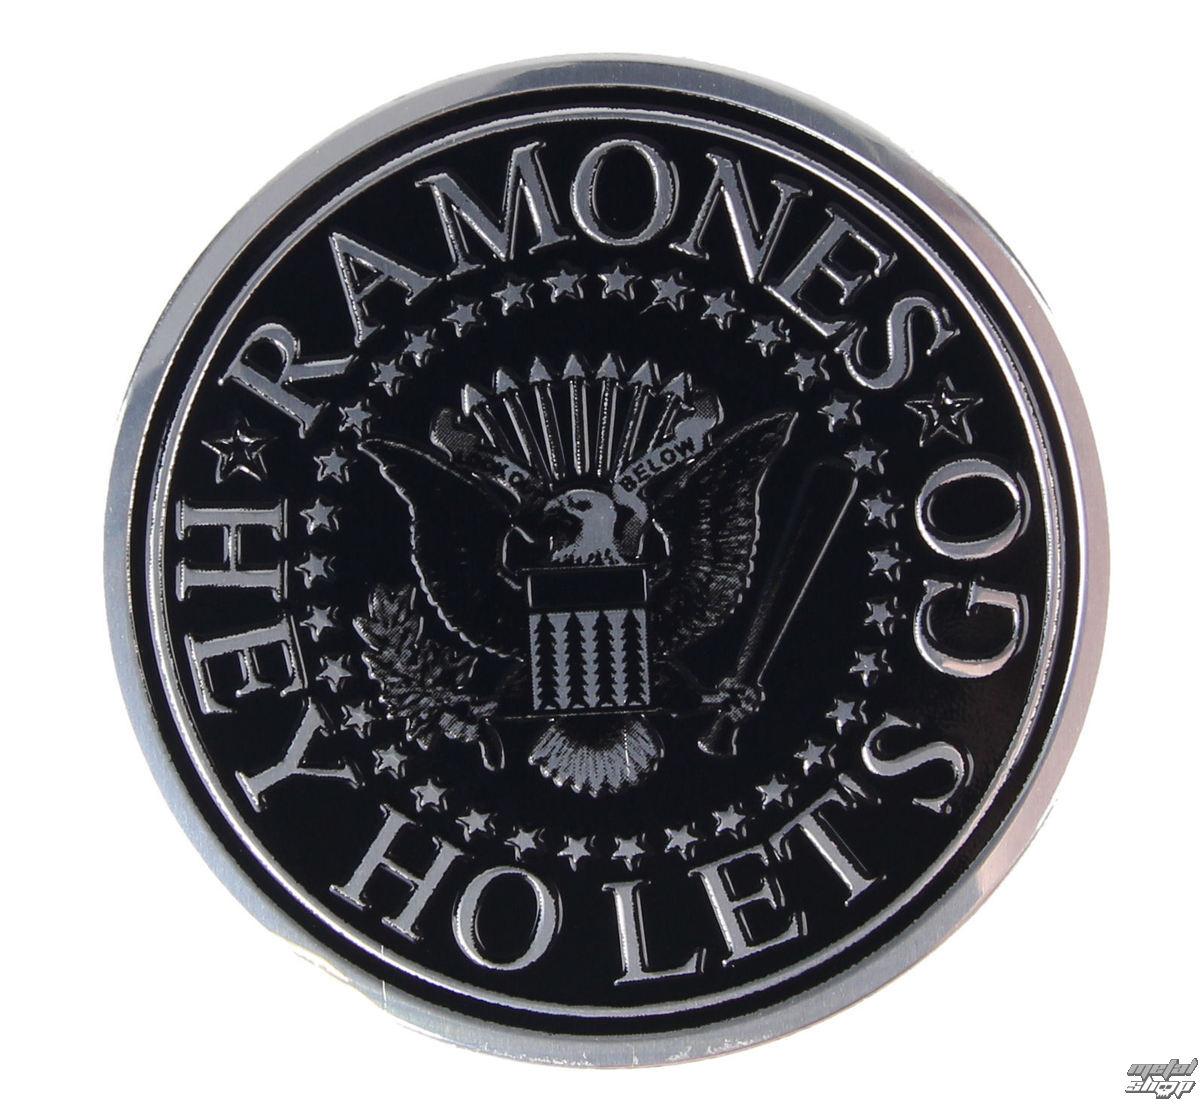 nálepka malá (kovová) Ramones - Seal - S-7765-M